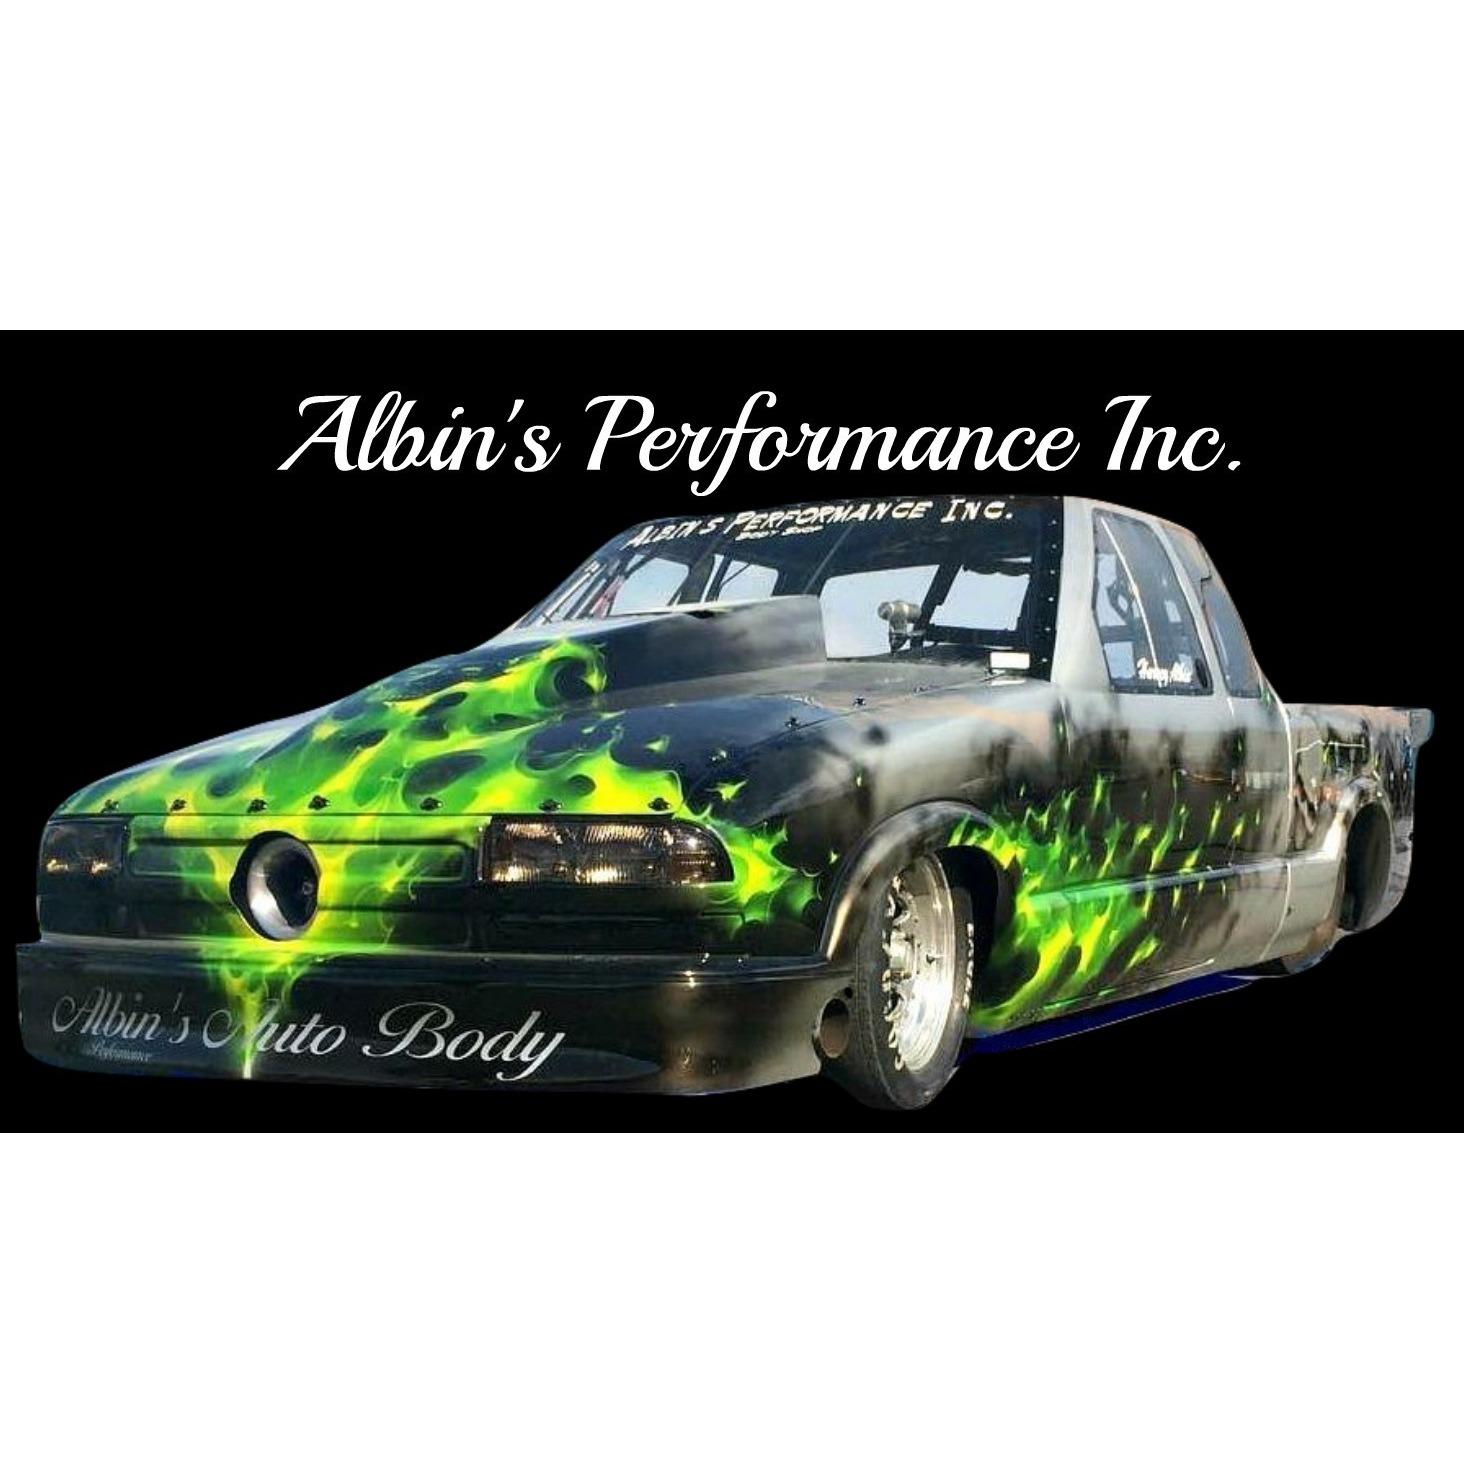 Albin's Performance Inc